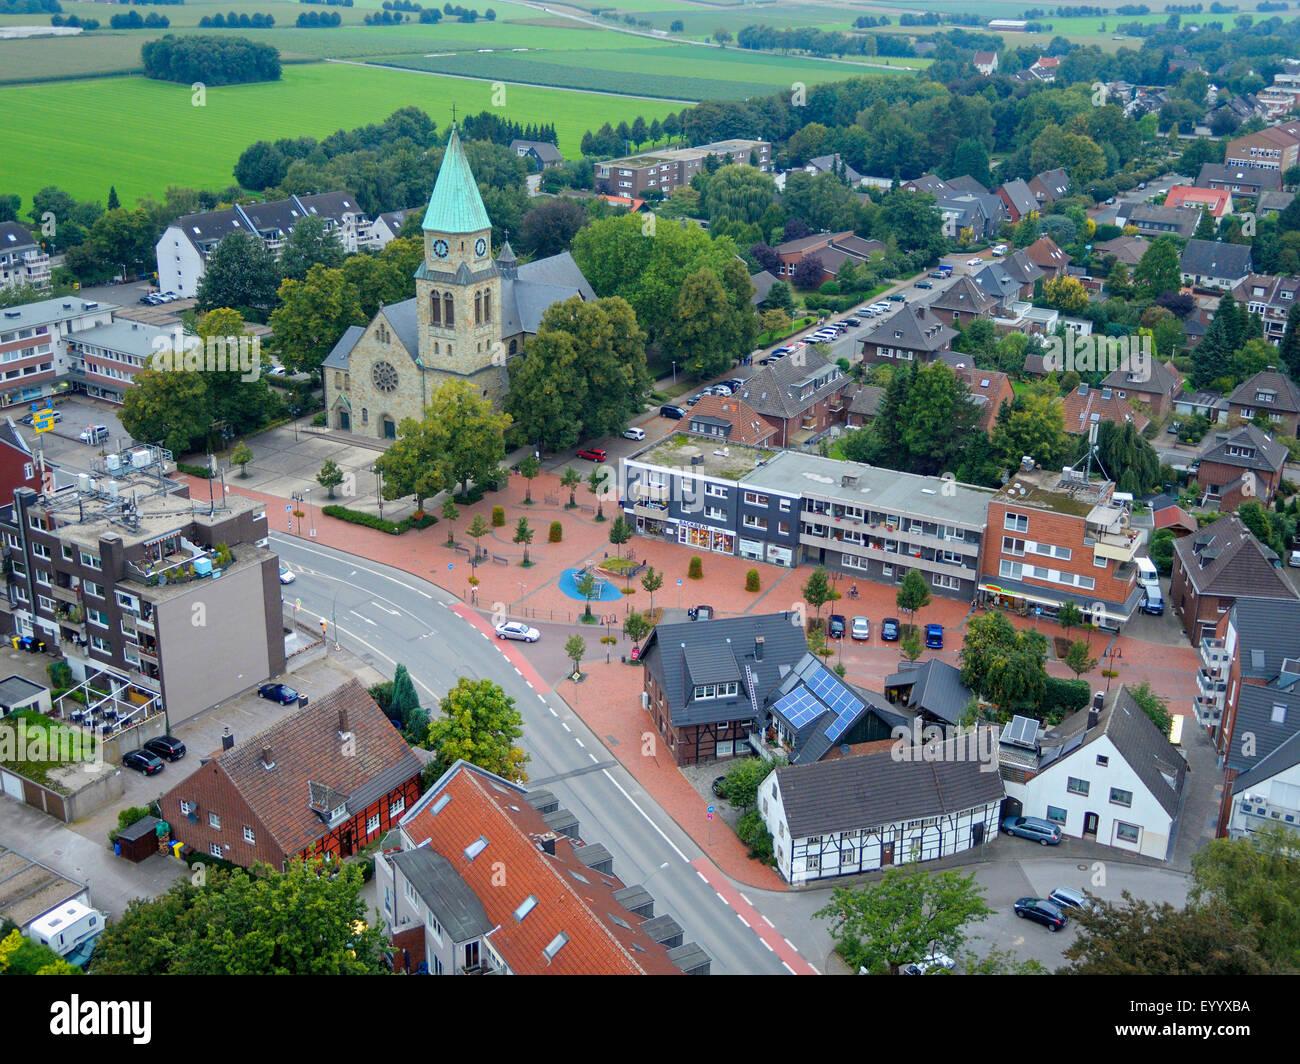 Luftbild Stadtteil Kirchhellen mit St Johannes Kirche